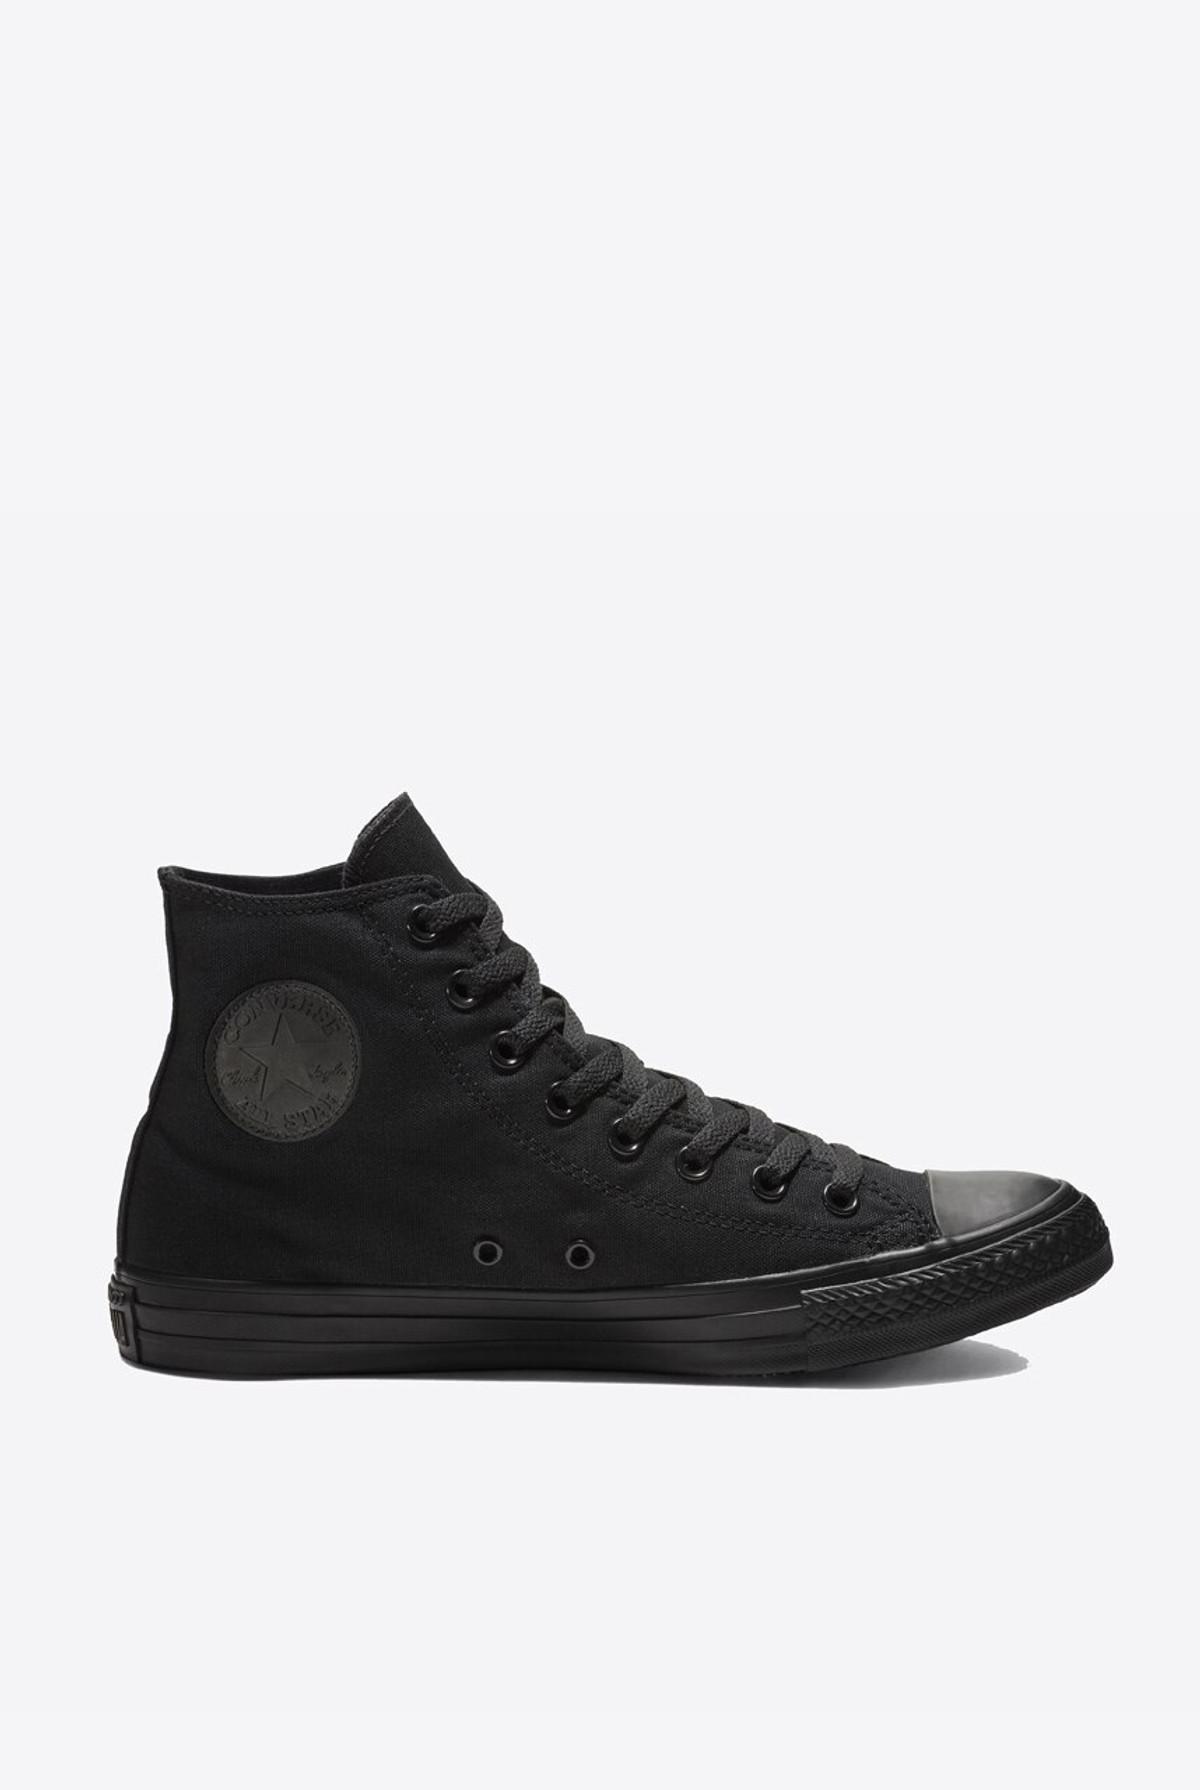 Converse Running Shoe CON150757C